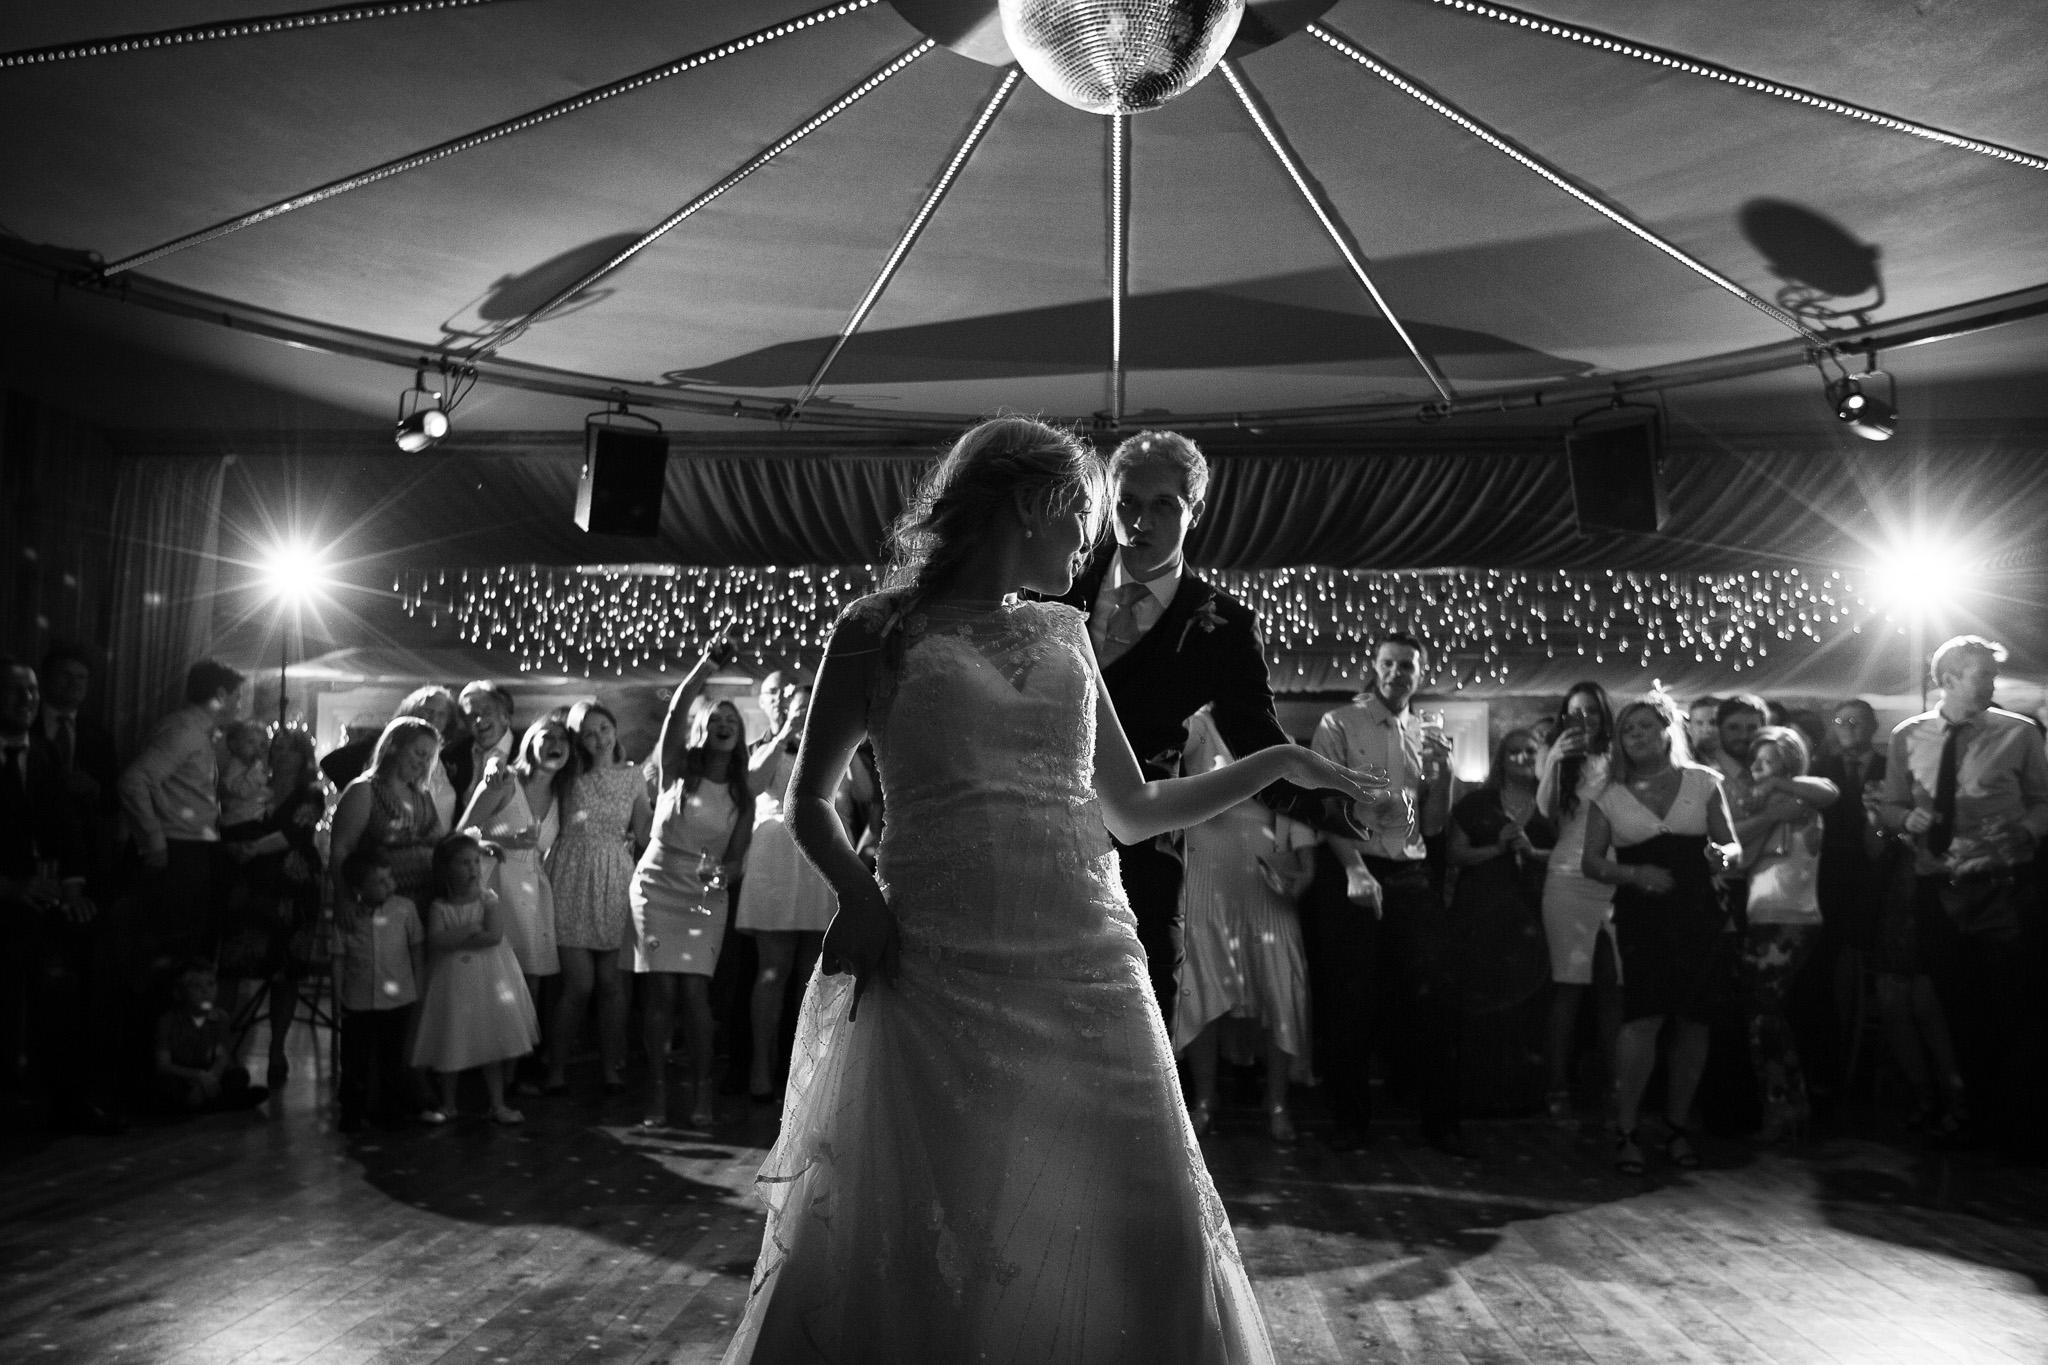 Mark_Barnes_Gloucester_Wedding_Photographer_Elmore_Court_Wedding_Photography_Mike+Kelly-103.jpg